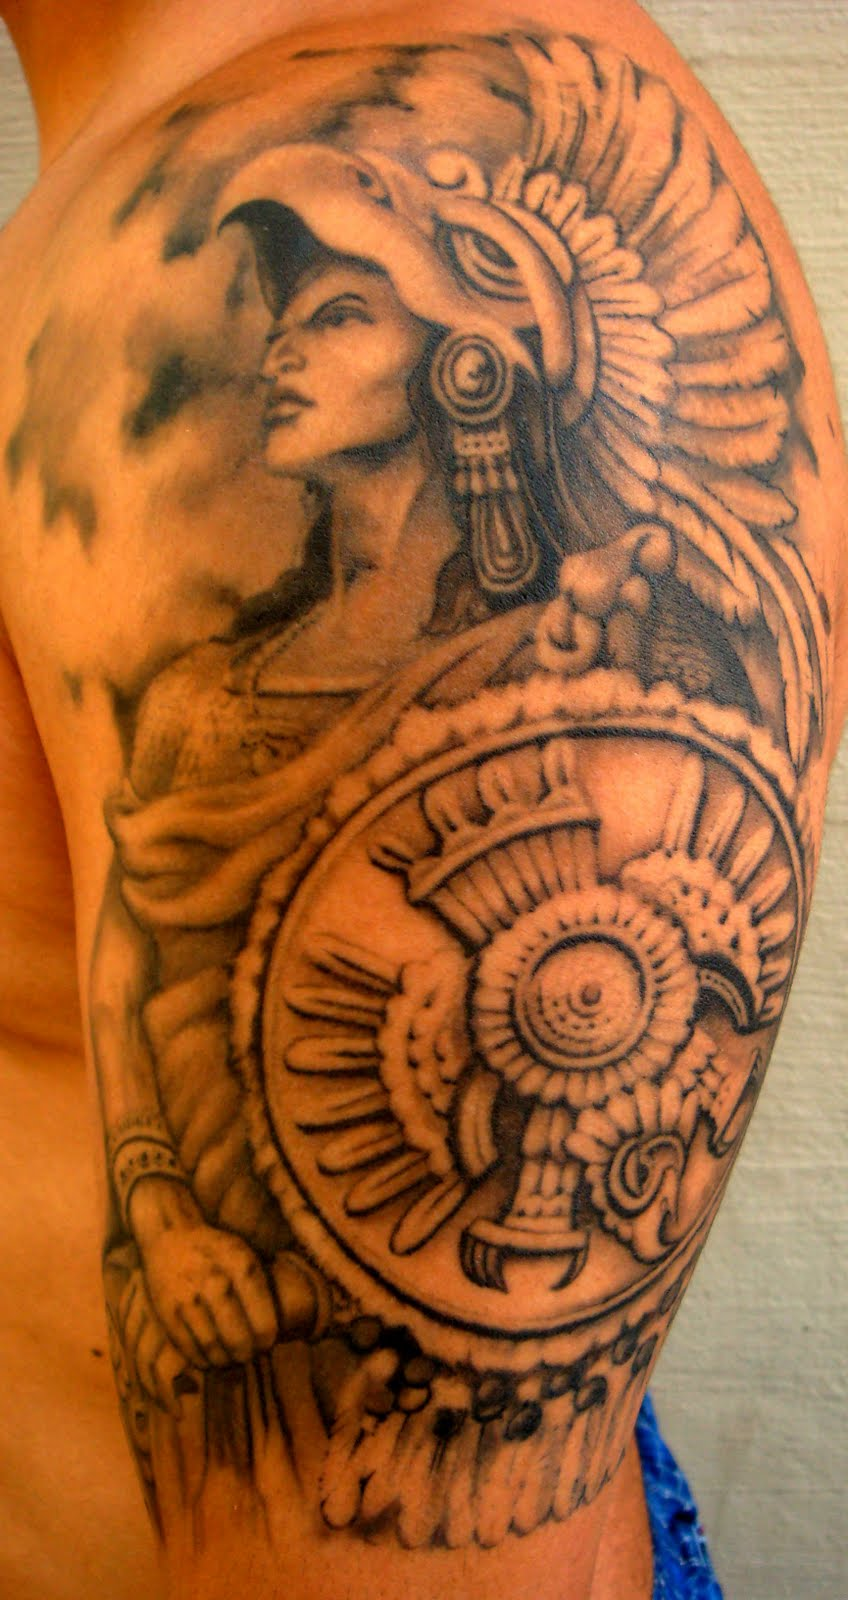 Los tatuajes tatuajes chicanos mexicanos for Mexican pride tattoos